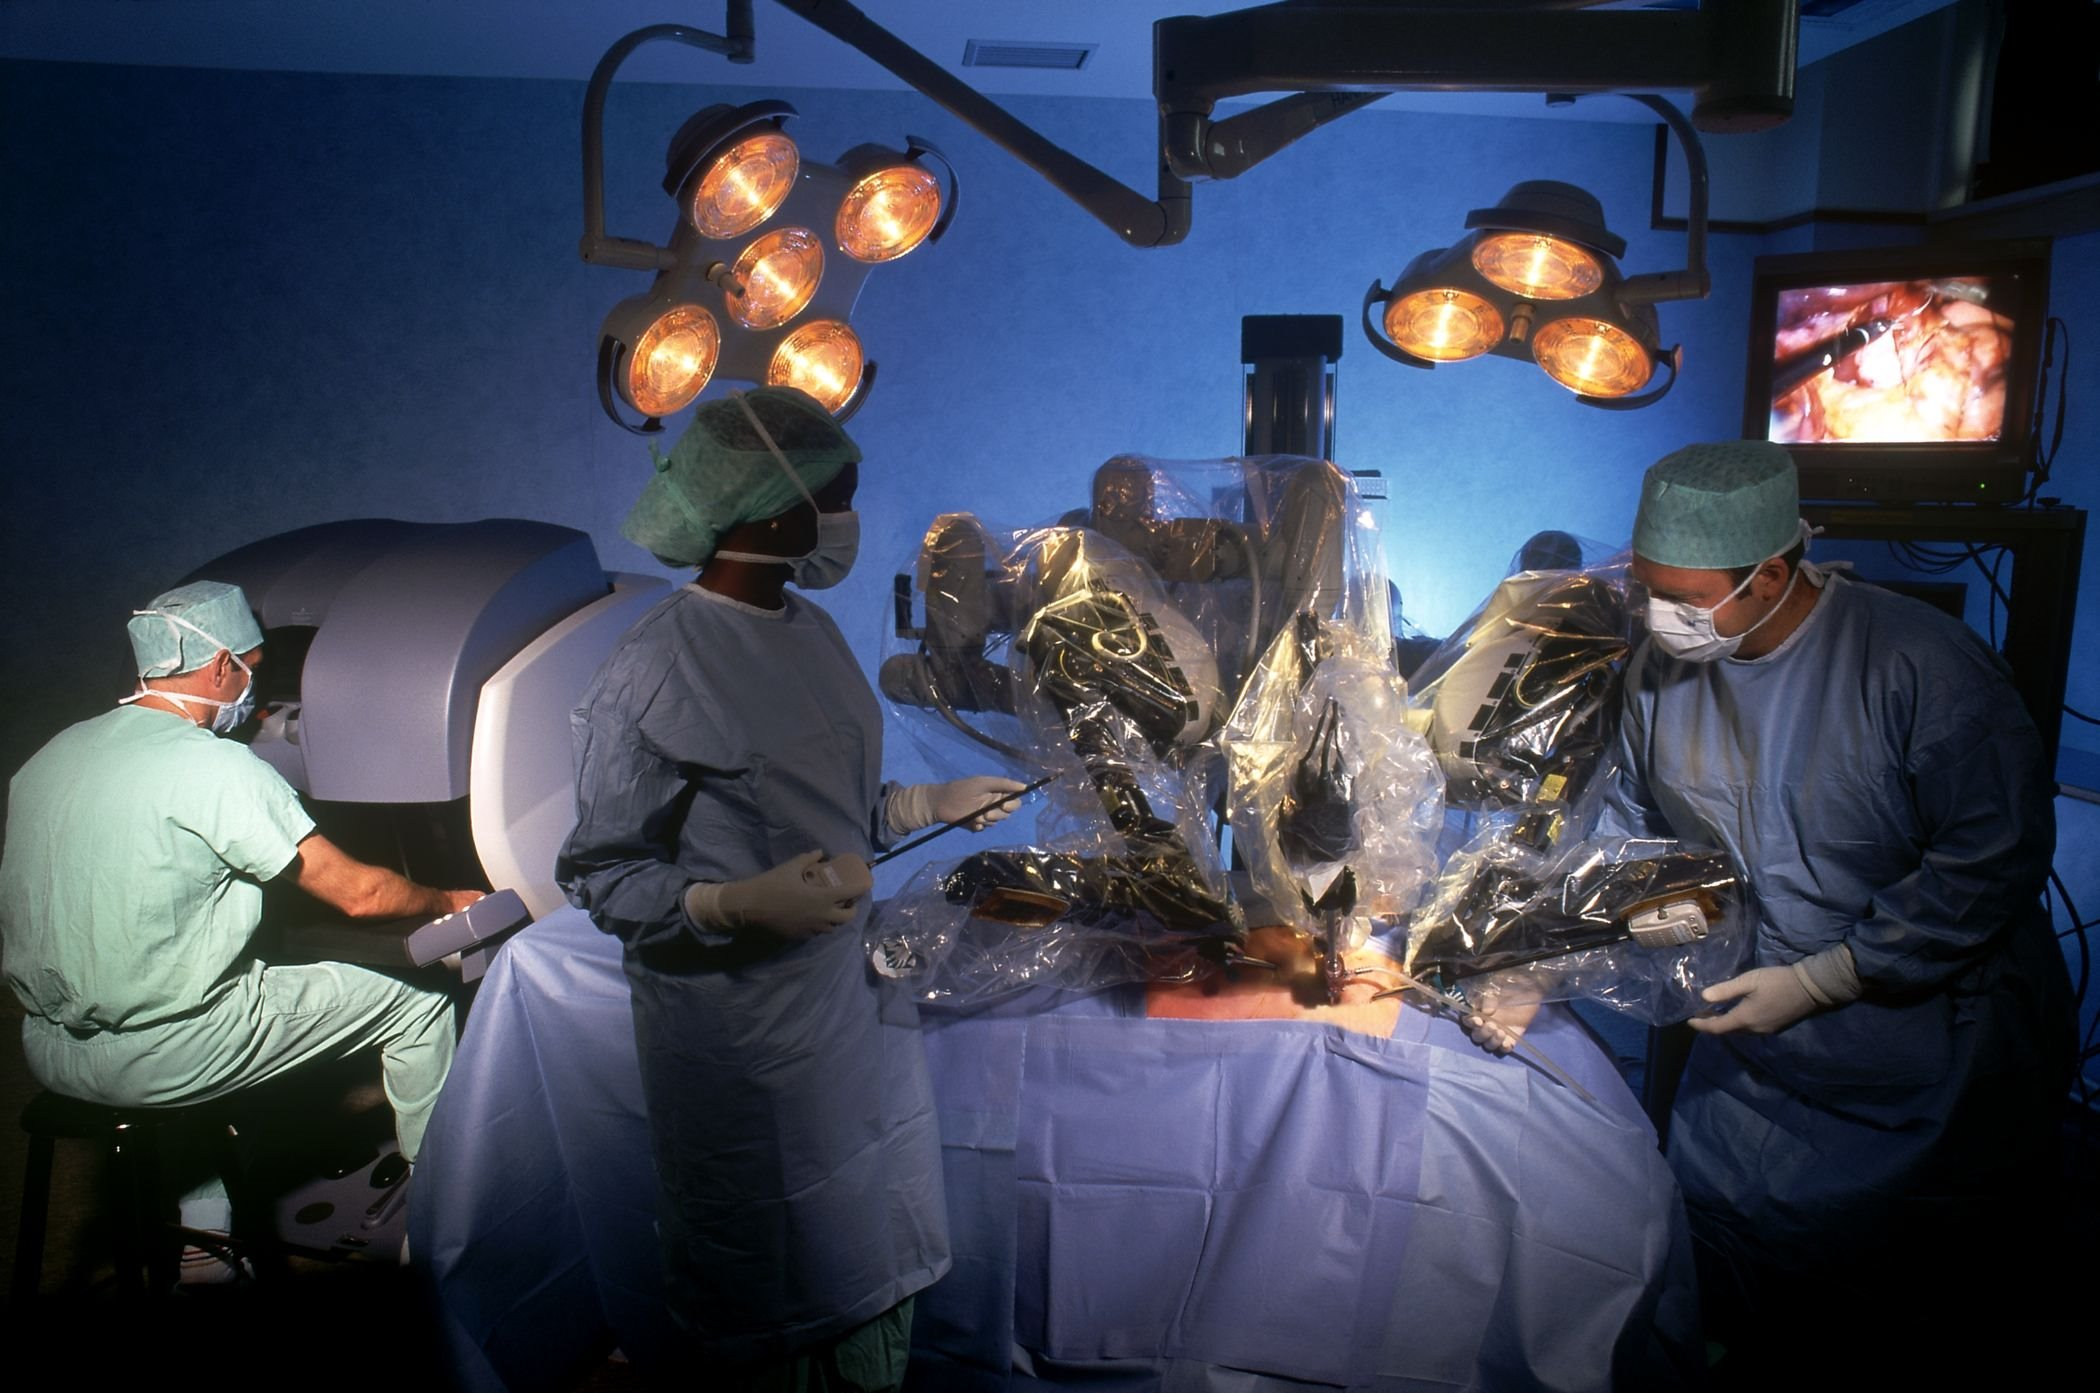 News-Da-Vinci-Surgical-Robot-3.jpg